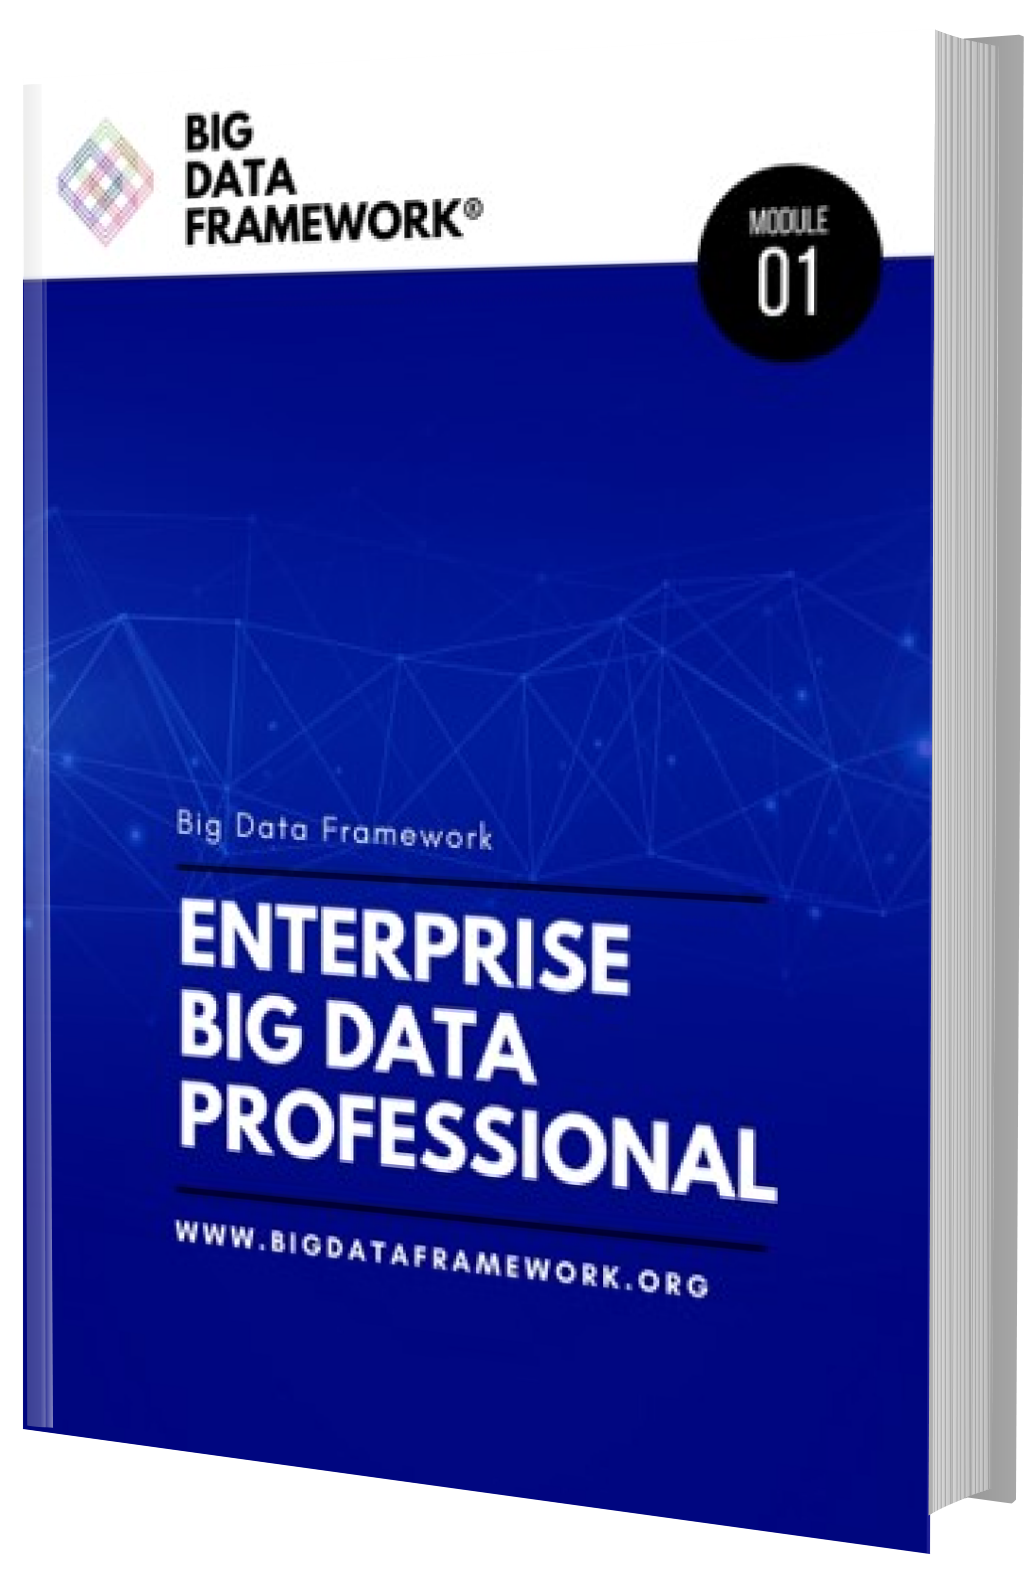 data enterprise professional guide certification framework email phone